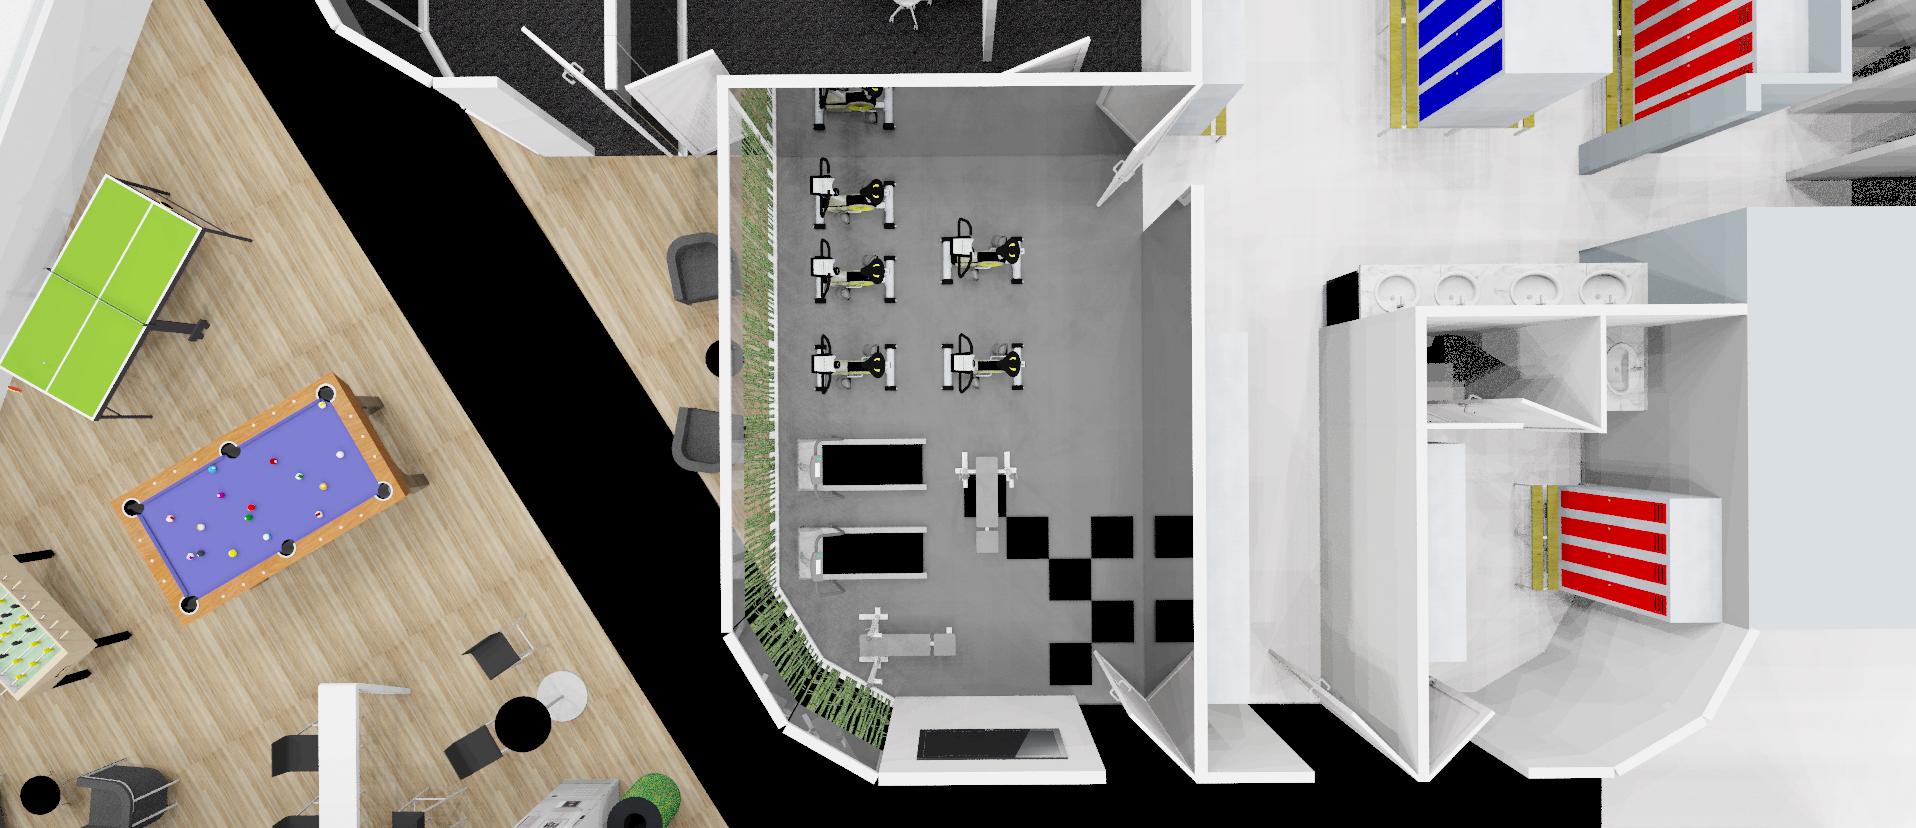 Plan 3D vue de haut